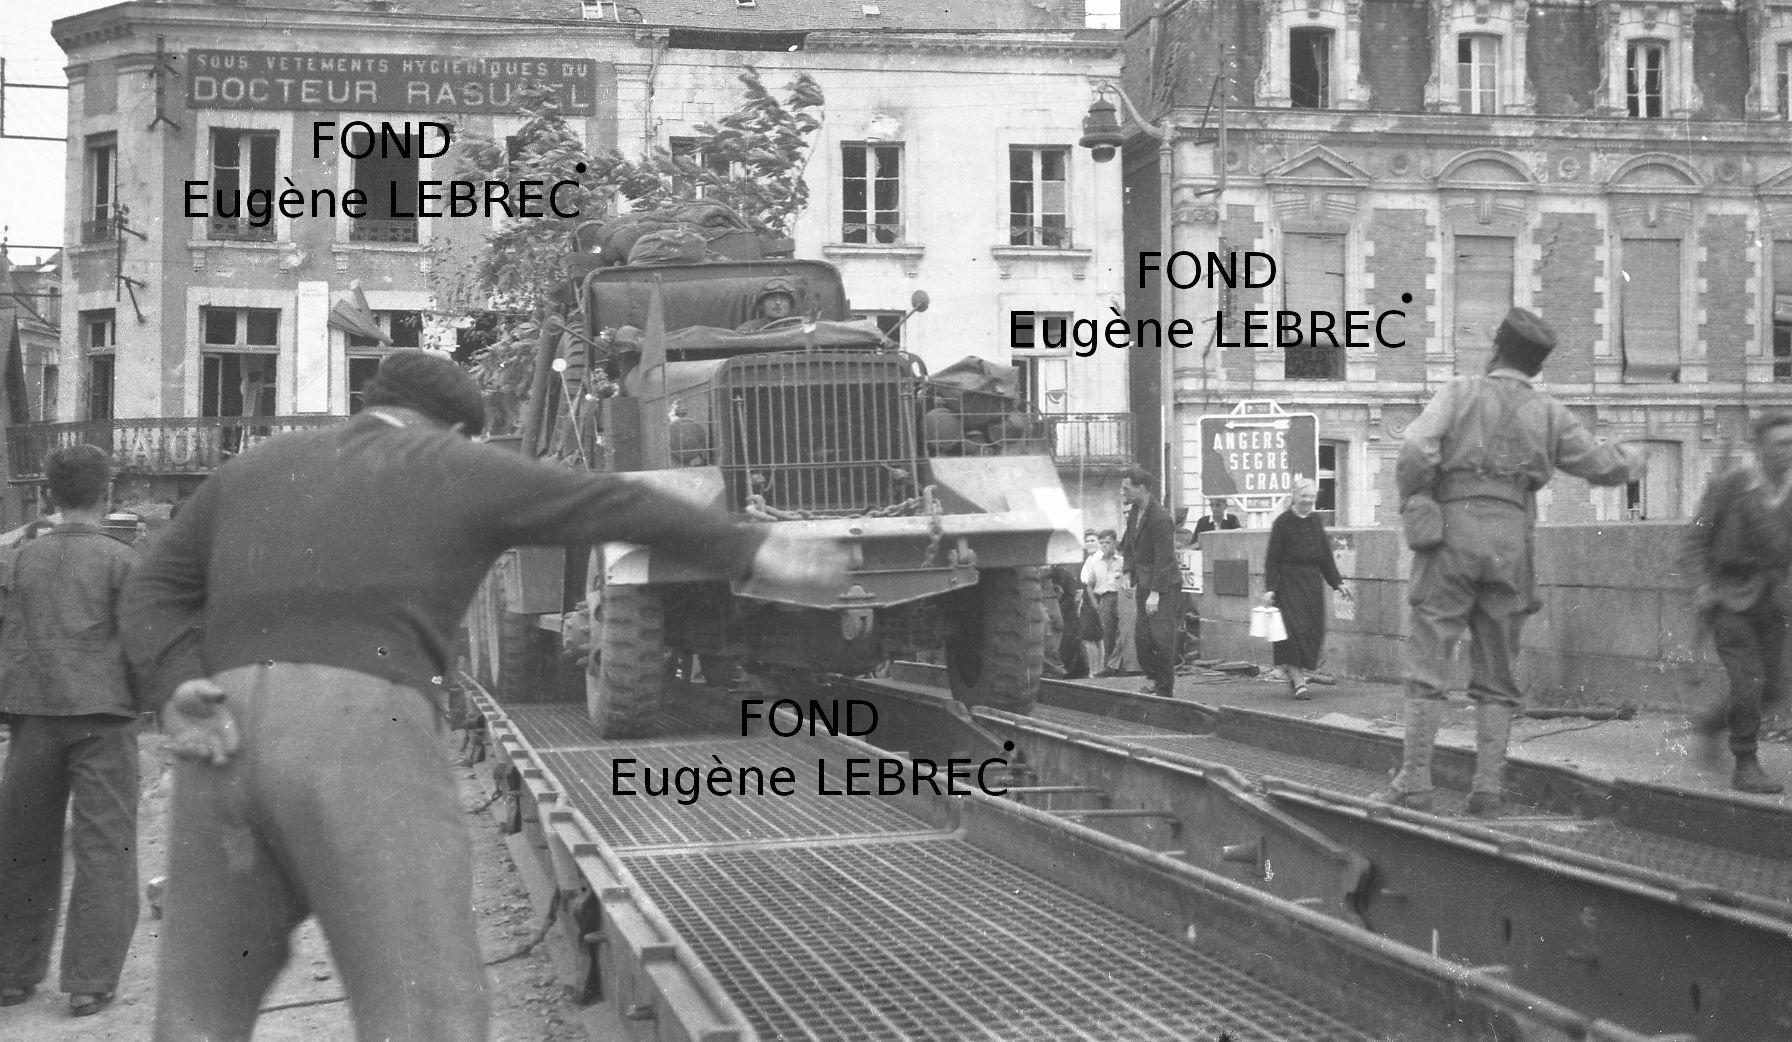 Chateau Gontier (Mayenne), véhicules à identifier - Page 2 64962214